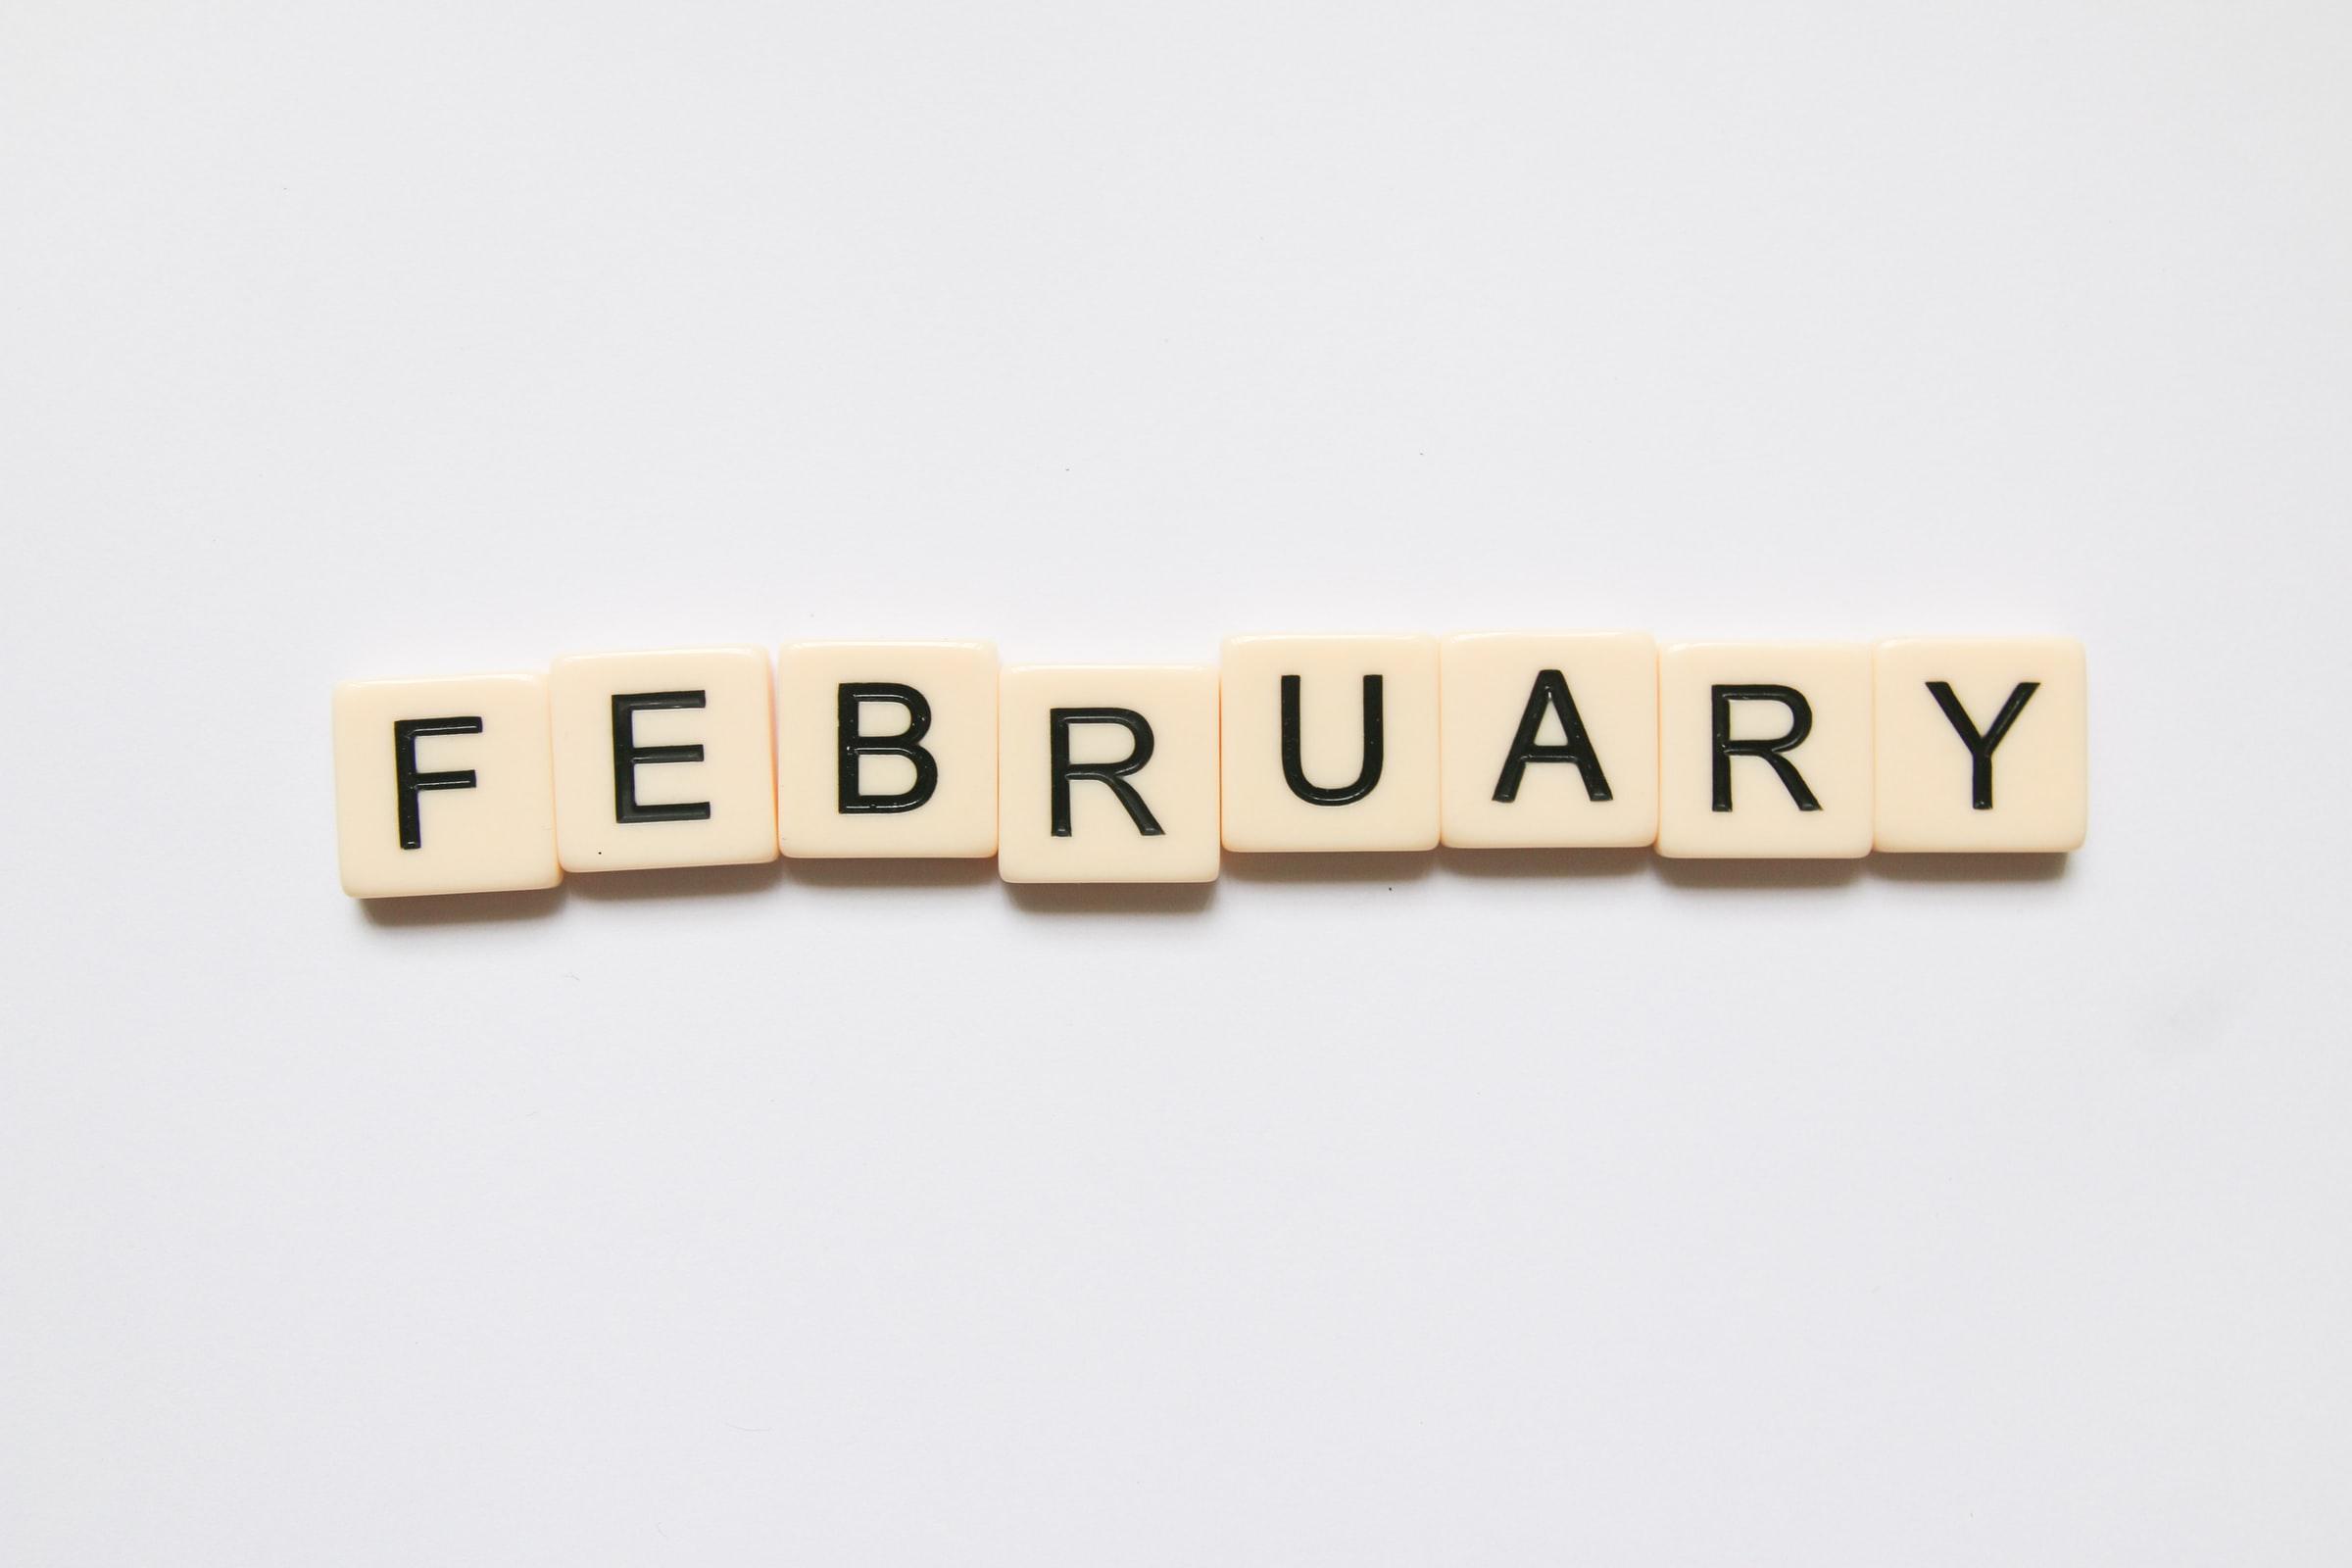 February Market Review Thumbnail